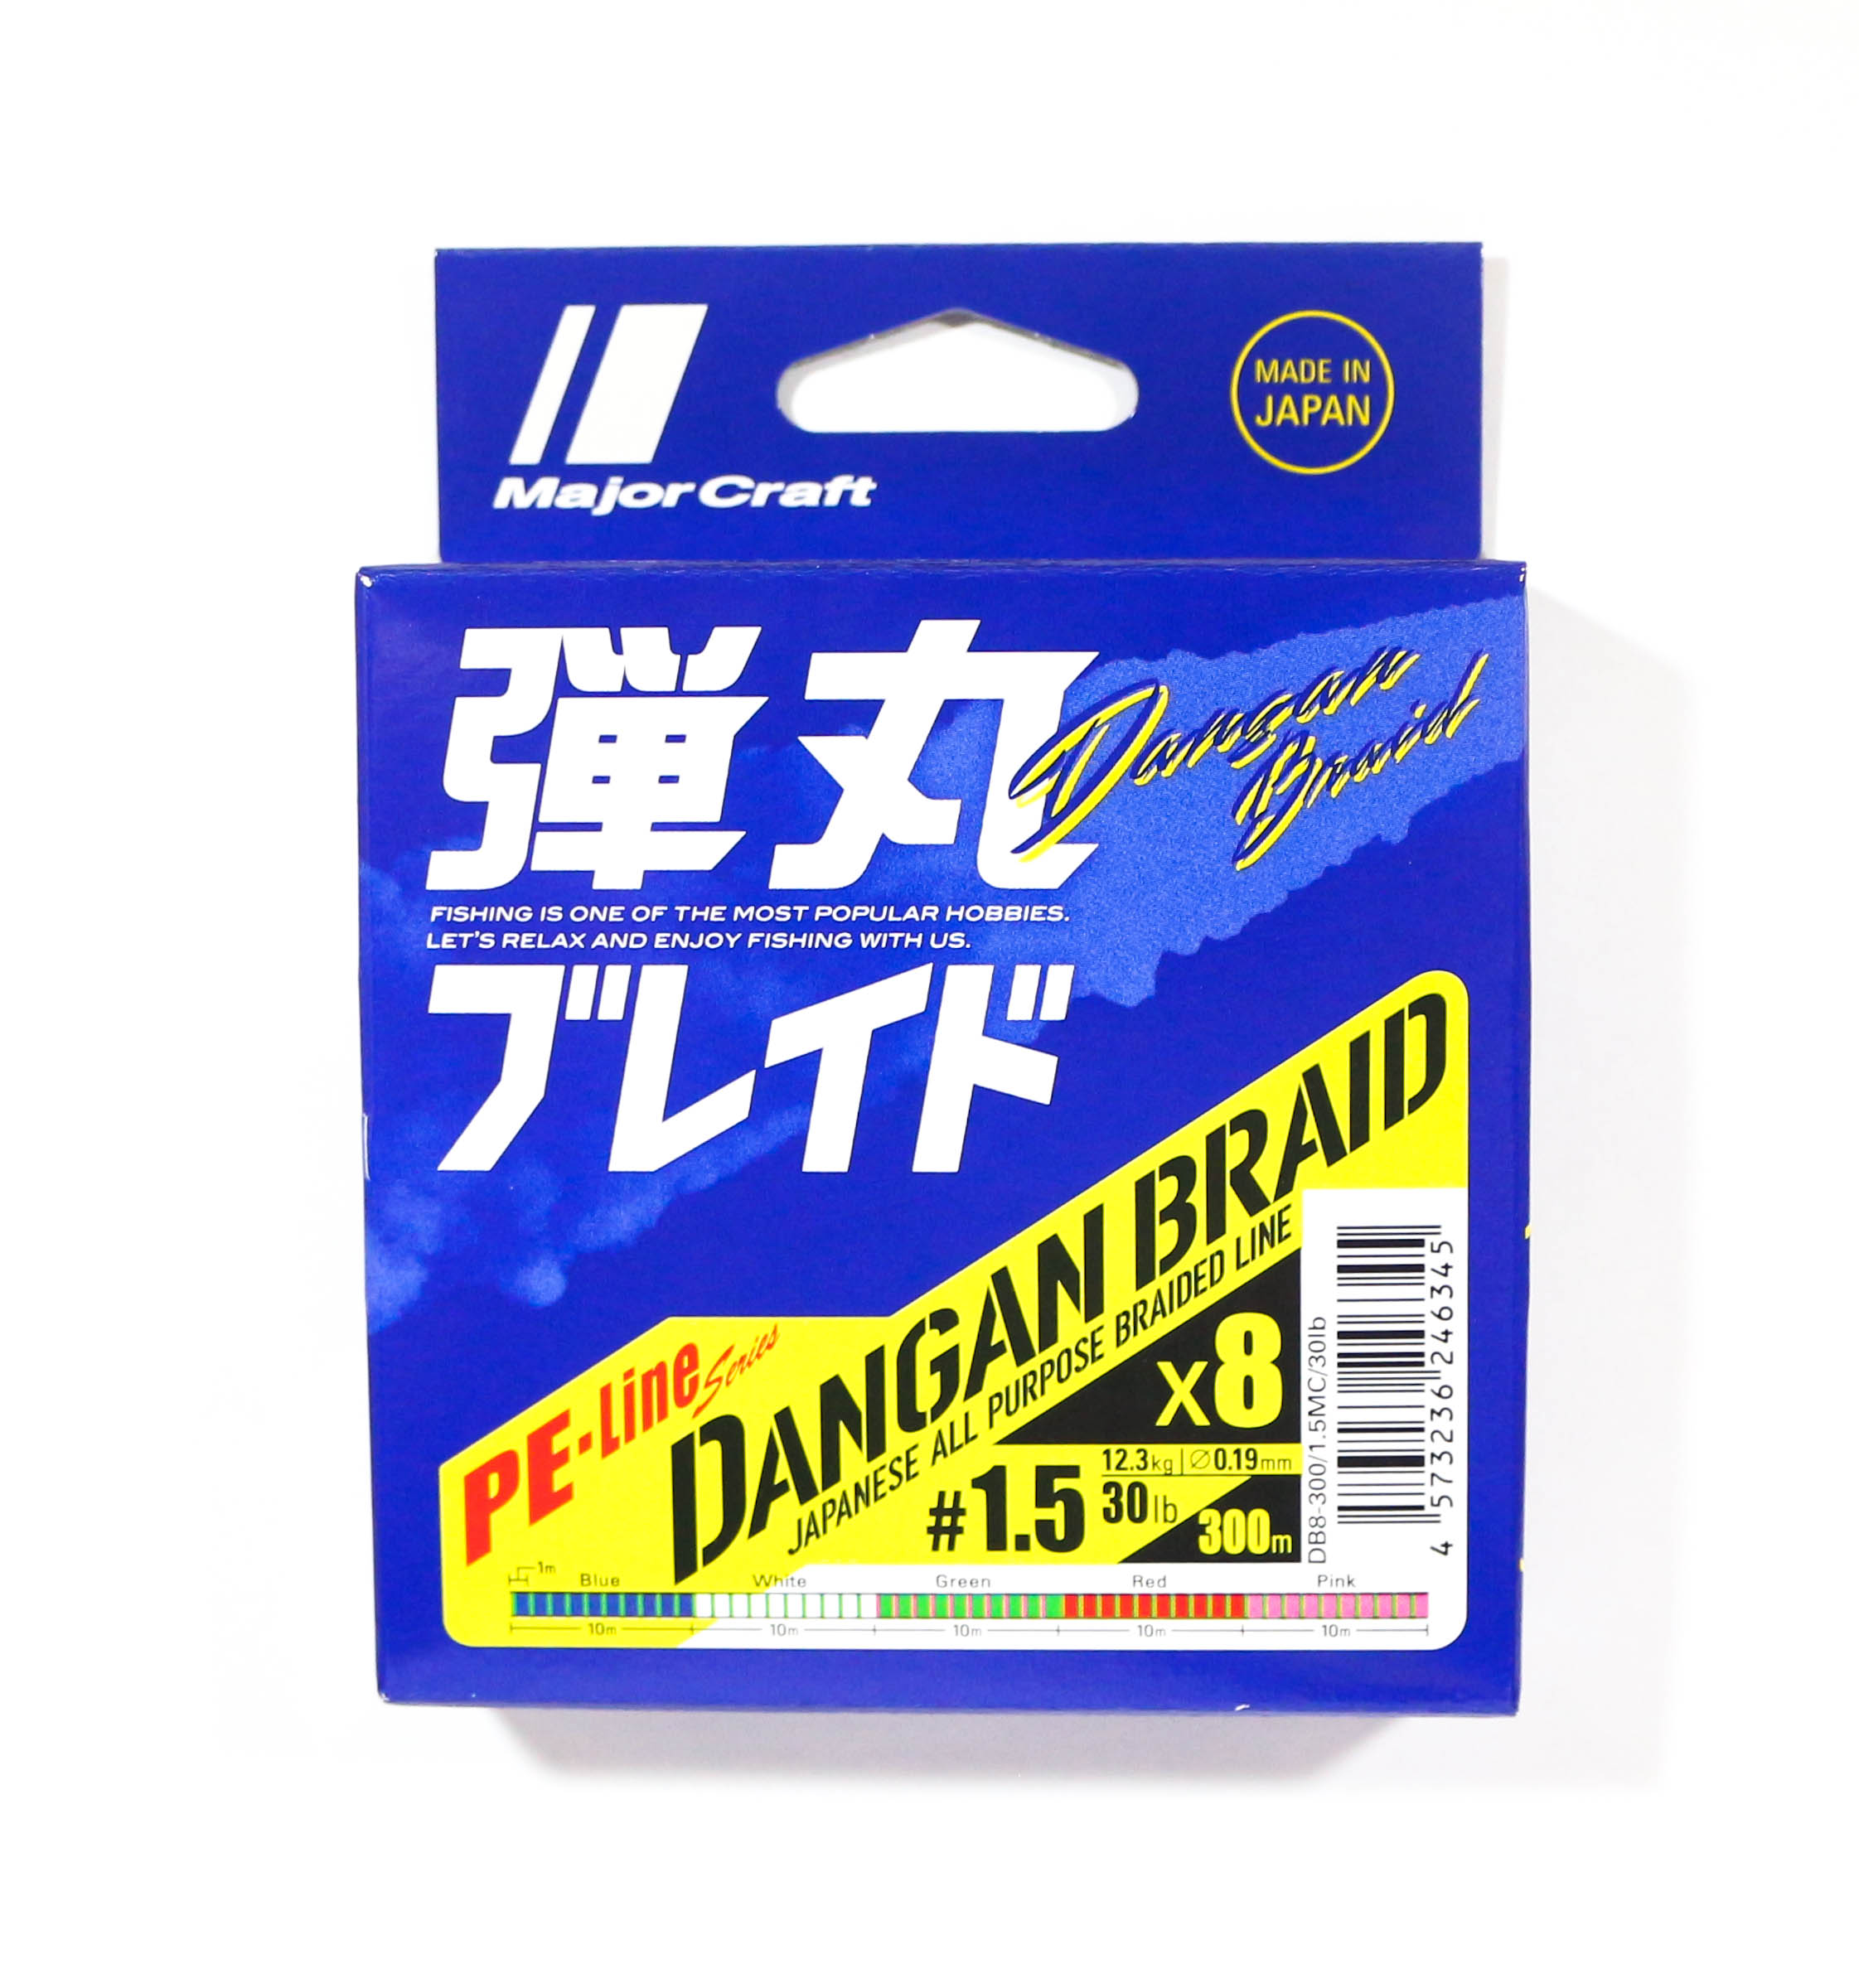 Major Craft Dangan Braided Line X8 300m P.E 1.5 Multi DB8-300/1.5MC/30lb (6345)